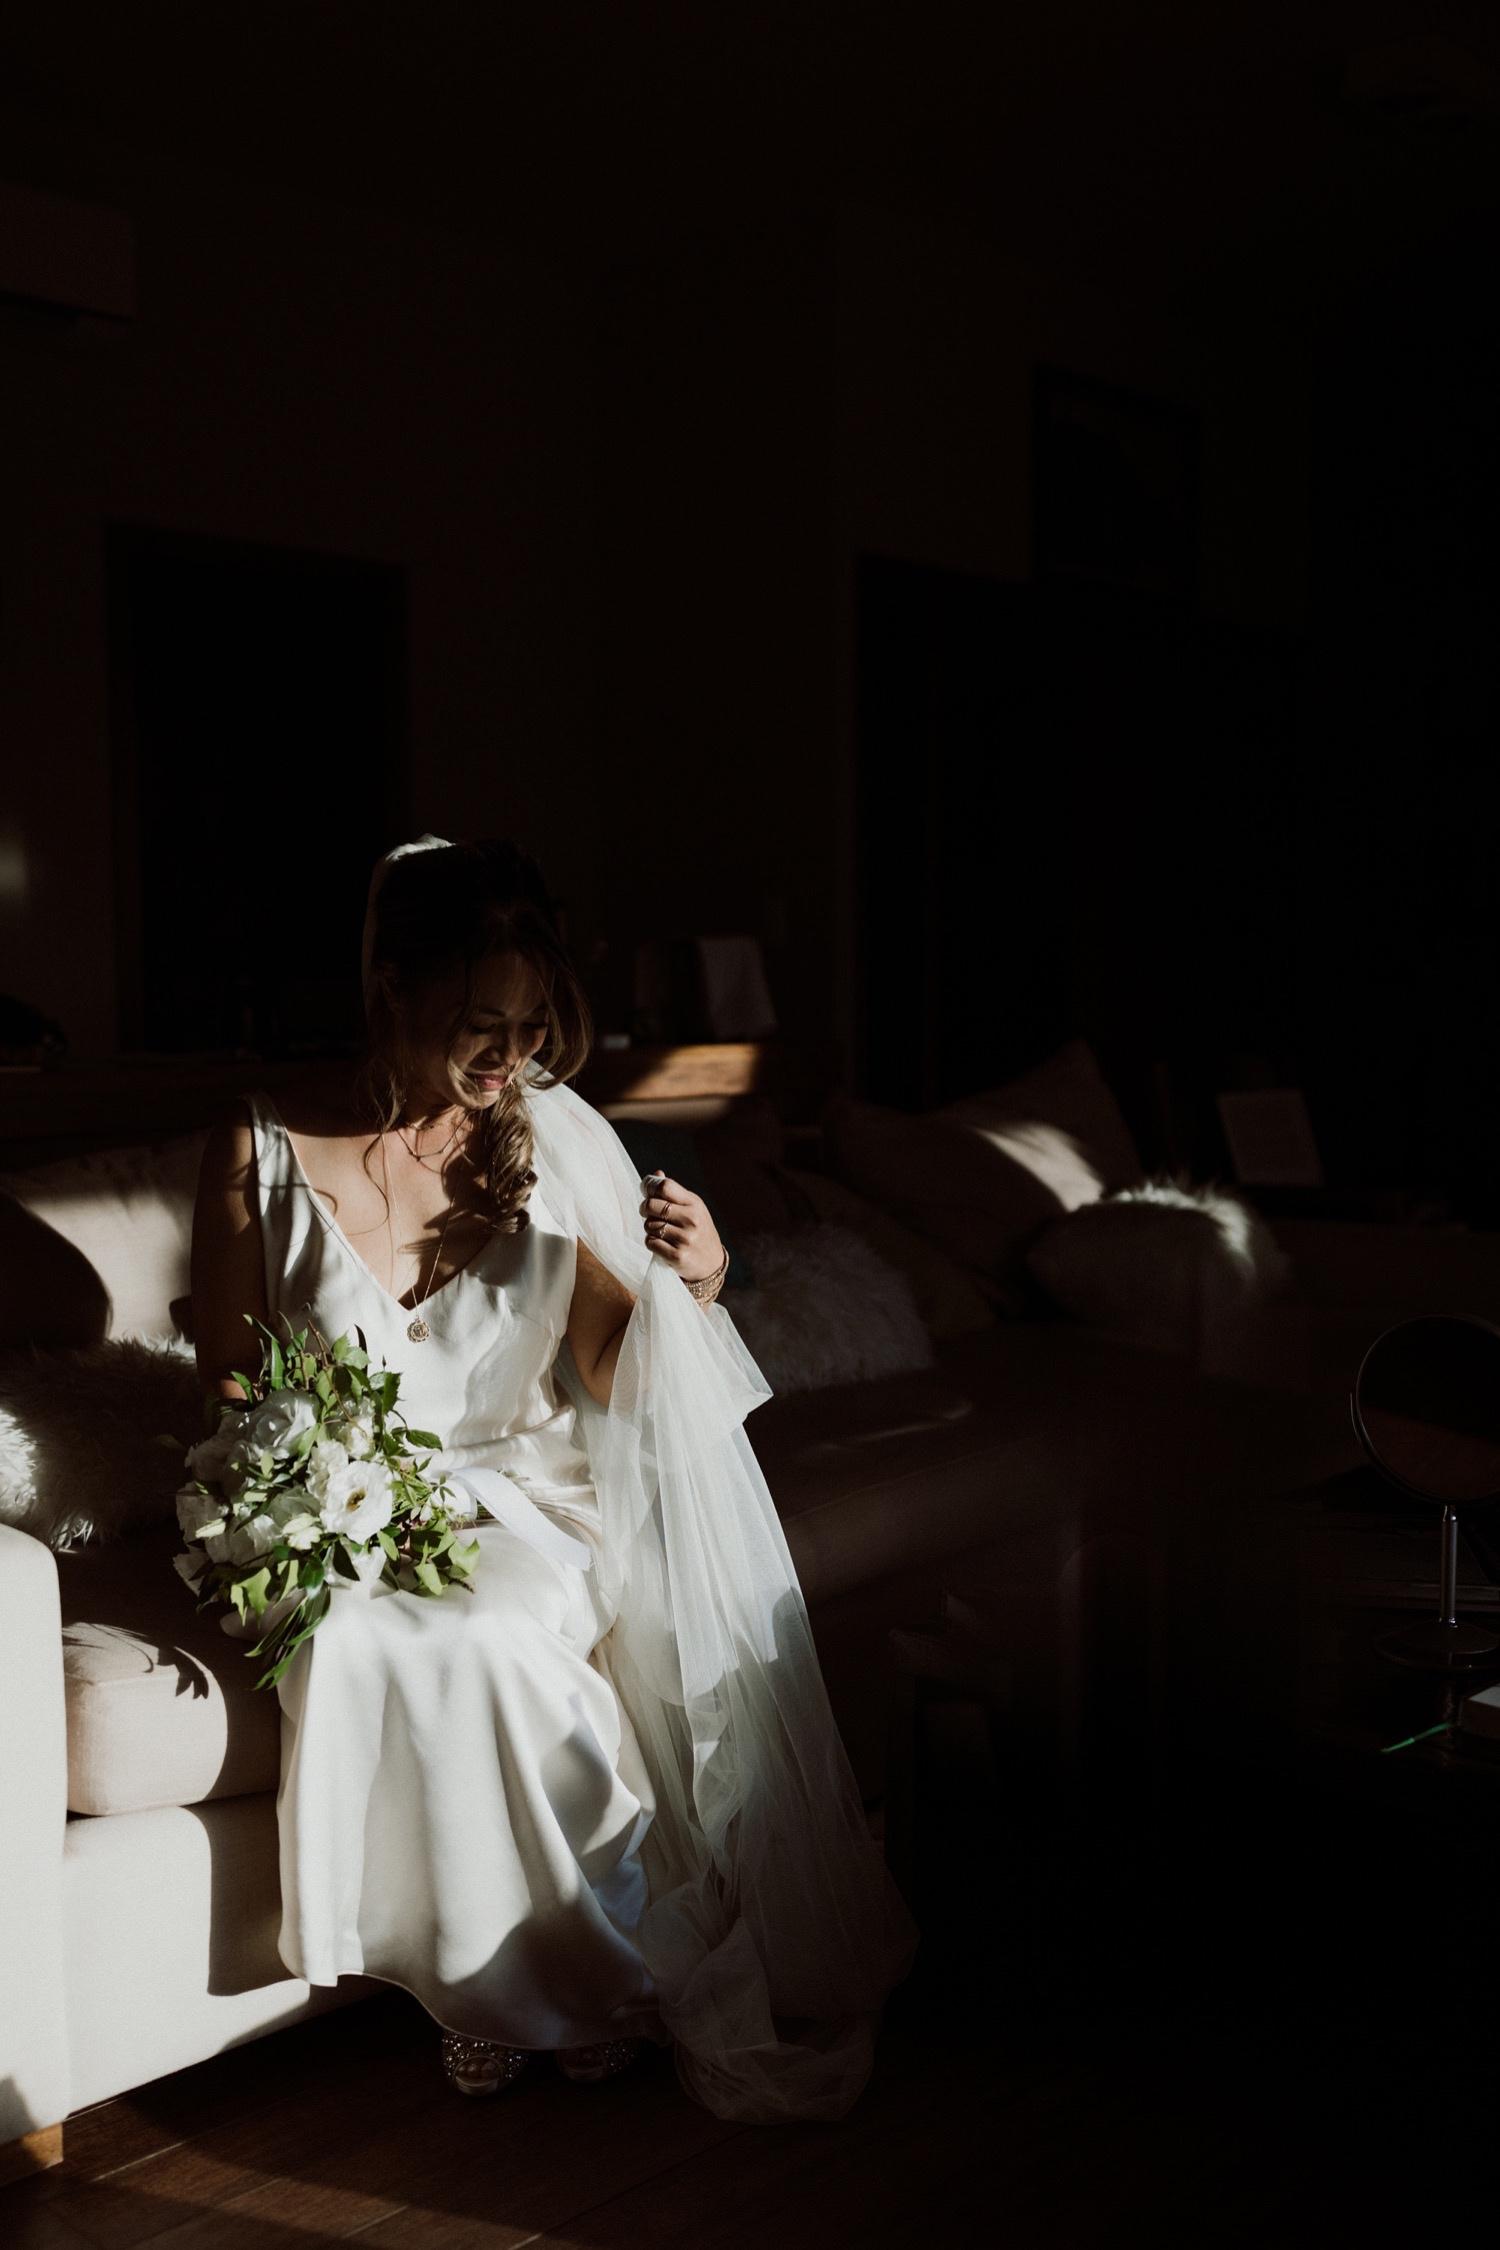 046_bride_before_ceremony.jpg